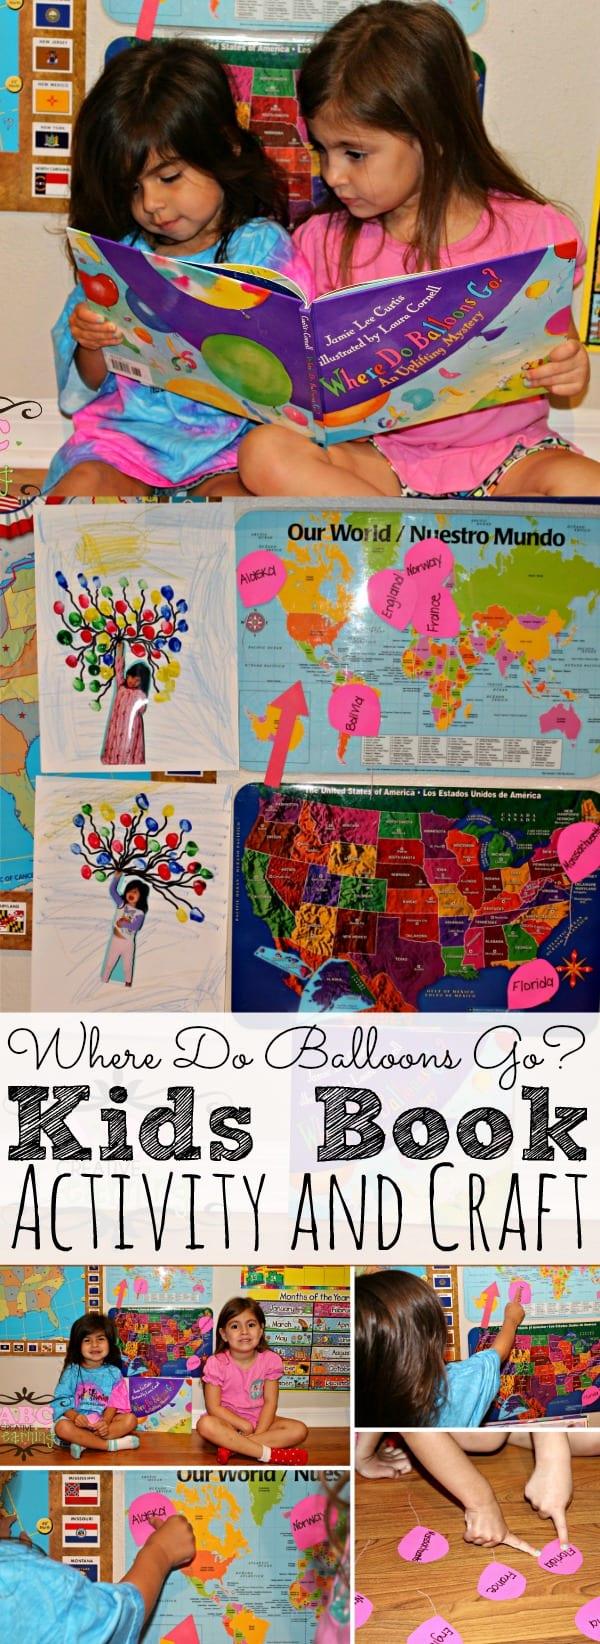 Where Do Balloons Go? Book Activity - simplytodaylife.com